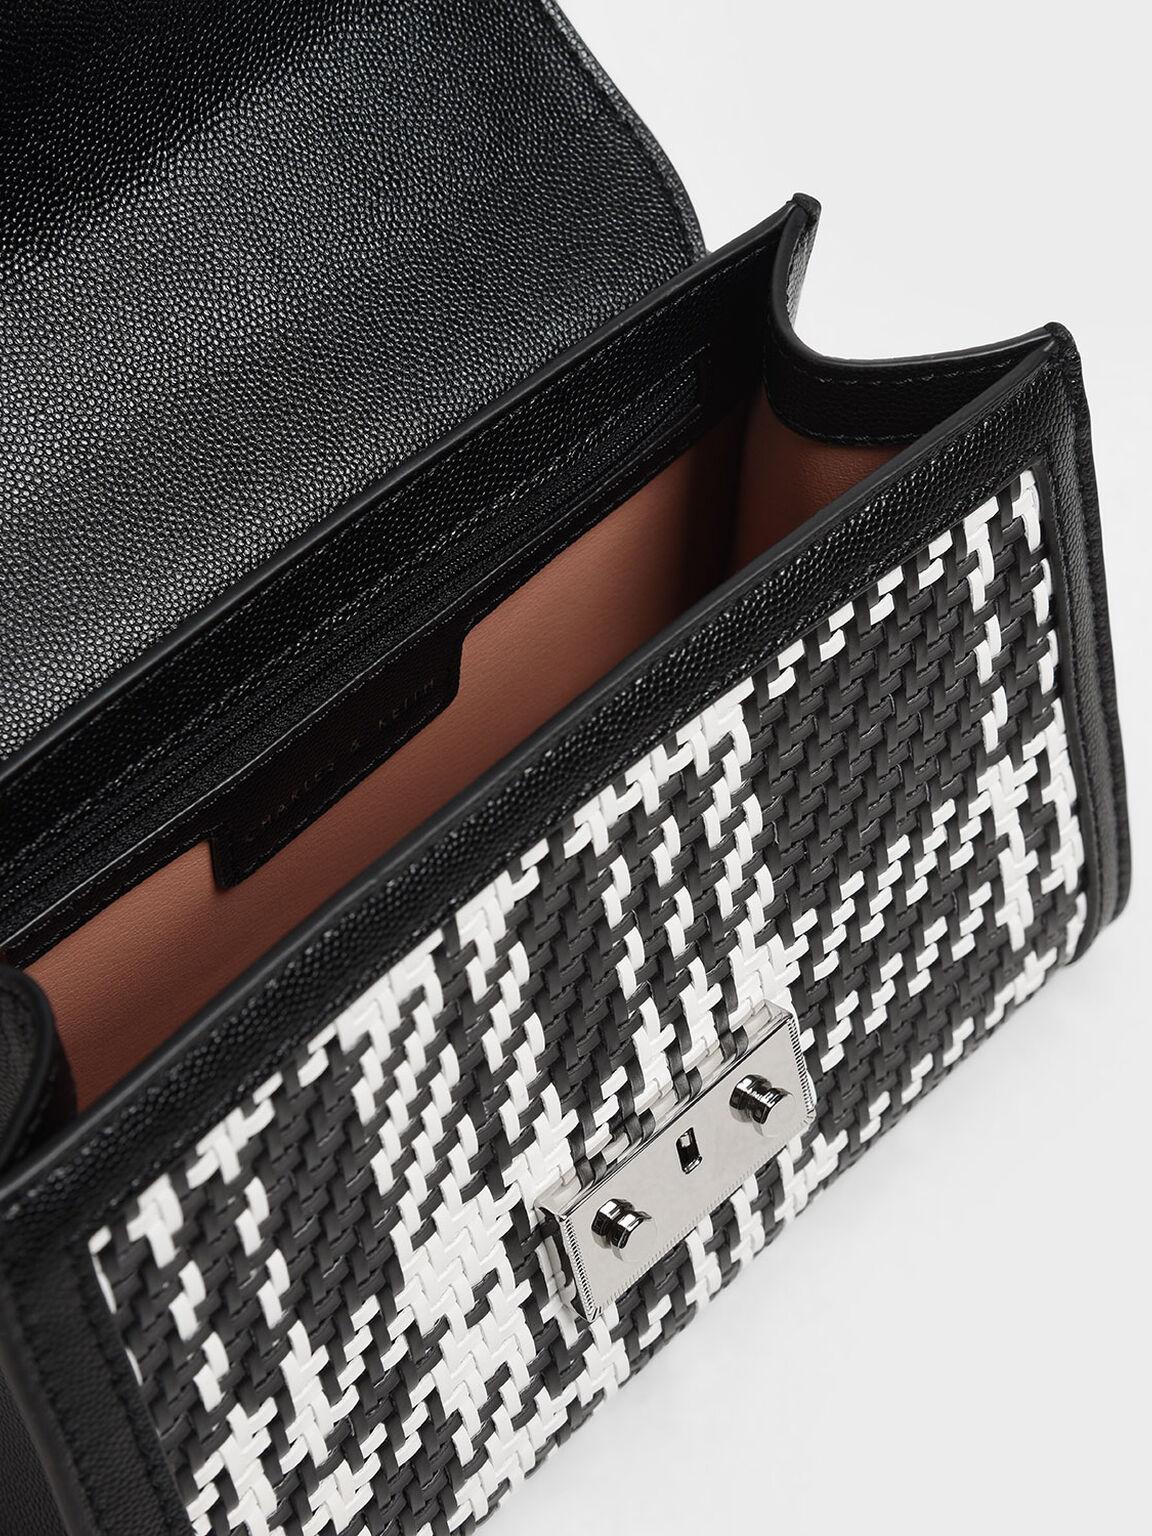 Woven Detail Clutch, Black, hi-res